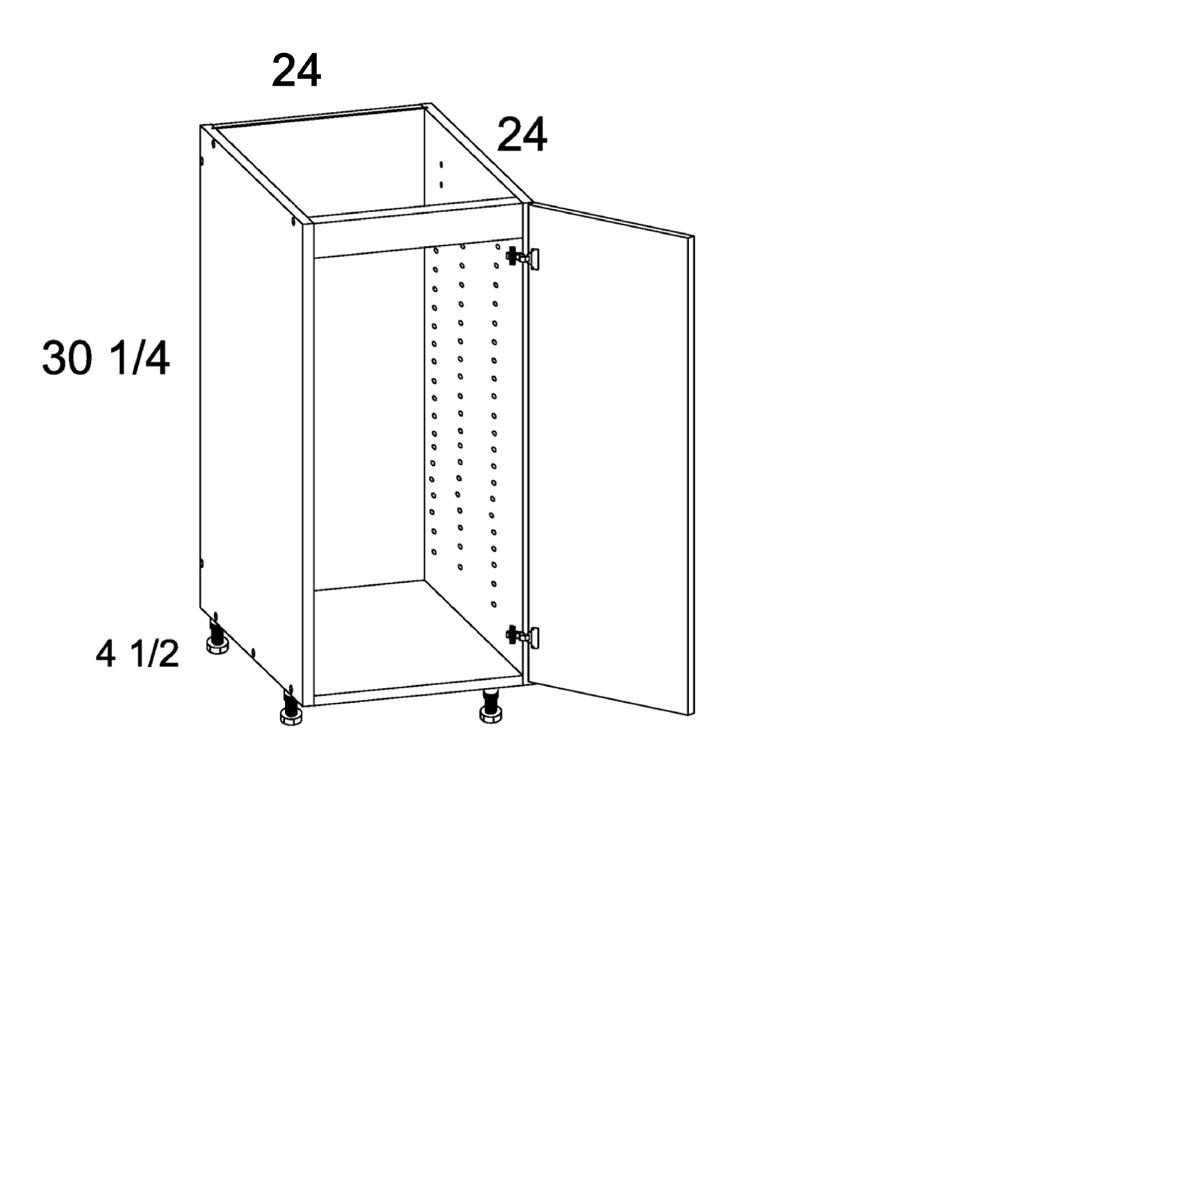 Cabinets, US Cabinet Depot Verona Pure Blank -us-cabinet-depot-verona-pure-blank-full-height-one-door-sink-base-24w-x-24d-x-30-1-4h-VPB-SB24SFH